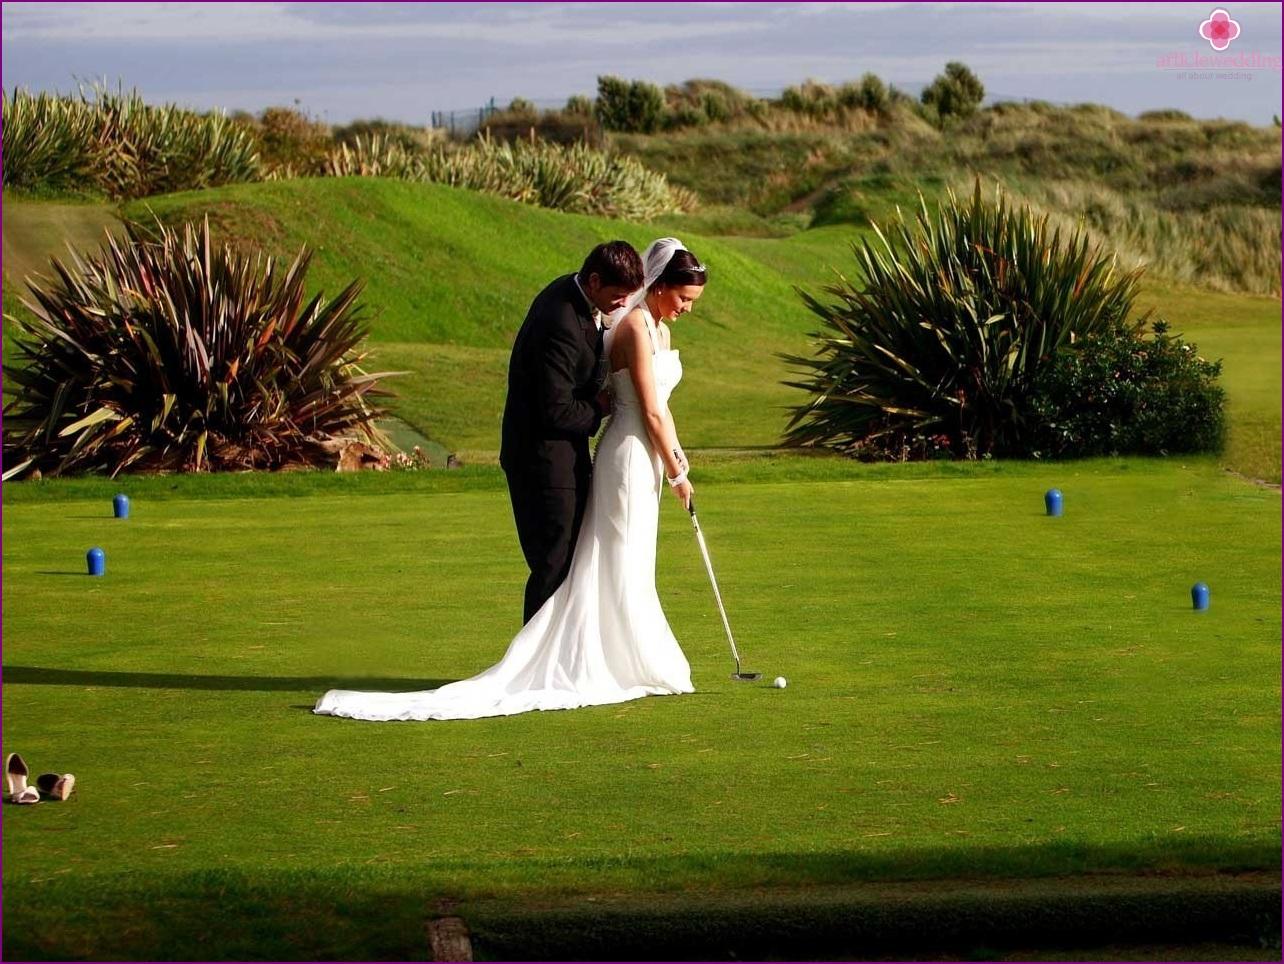 Golf club photo shoot